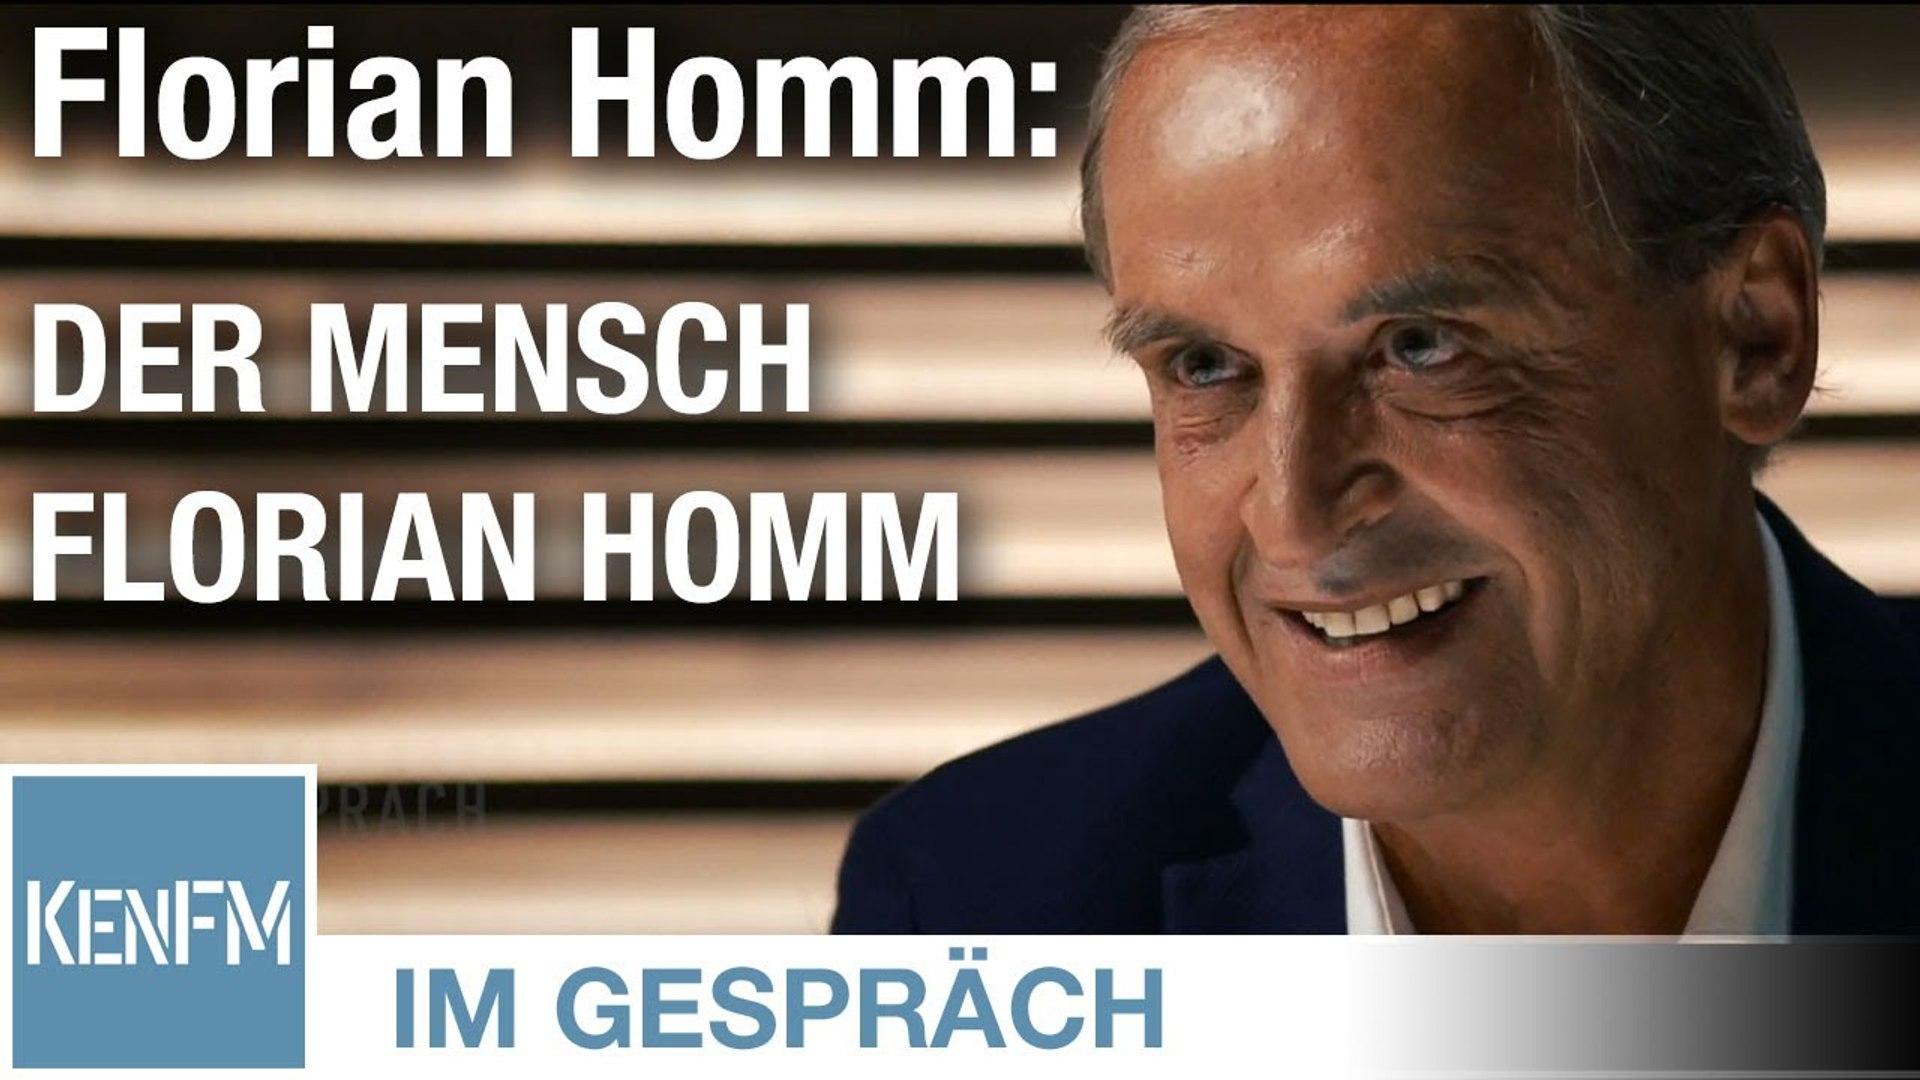 Im Gespräch: Florian Homm (Der Mensch Florian Homm)